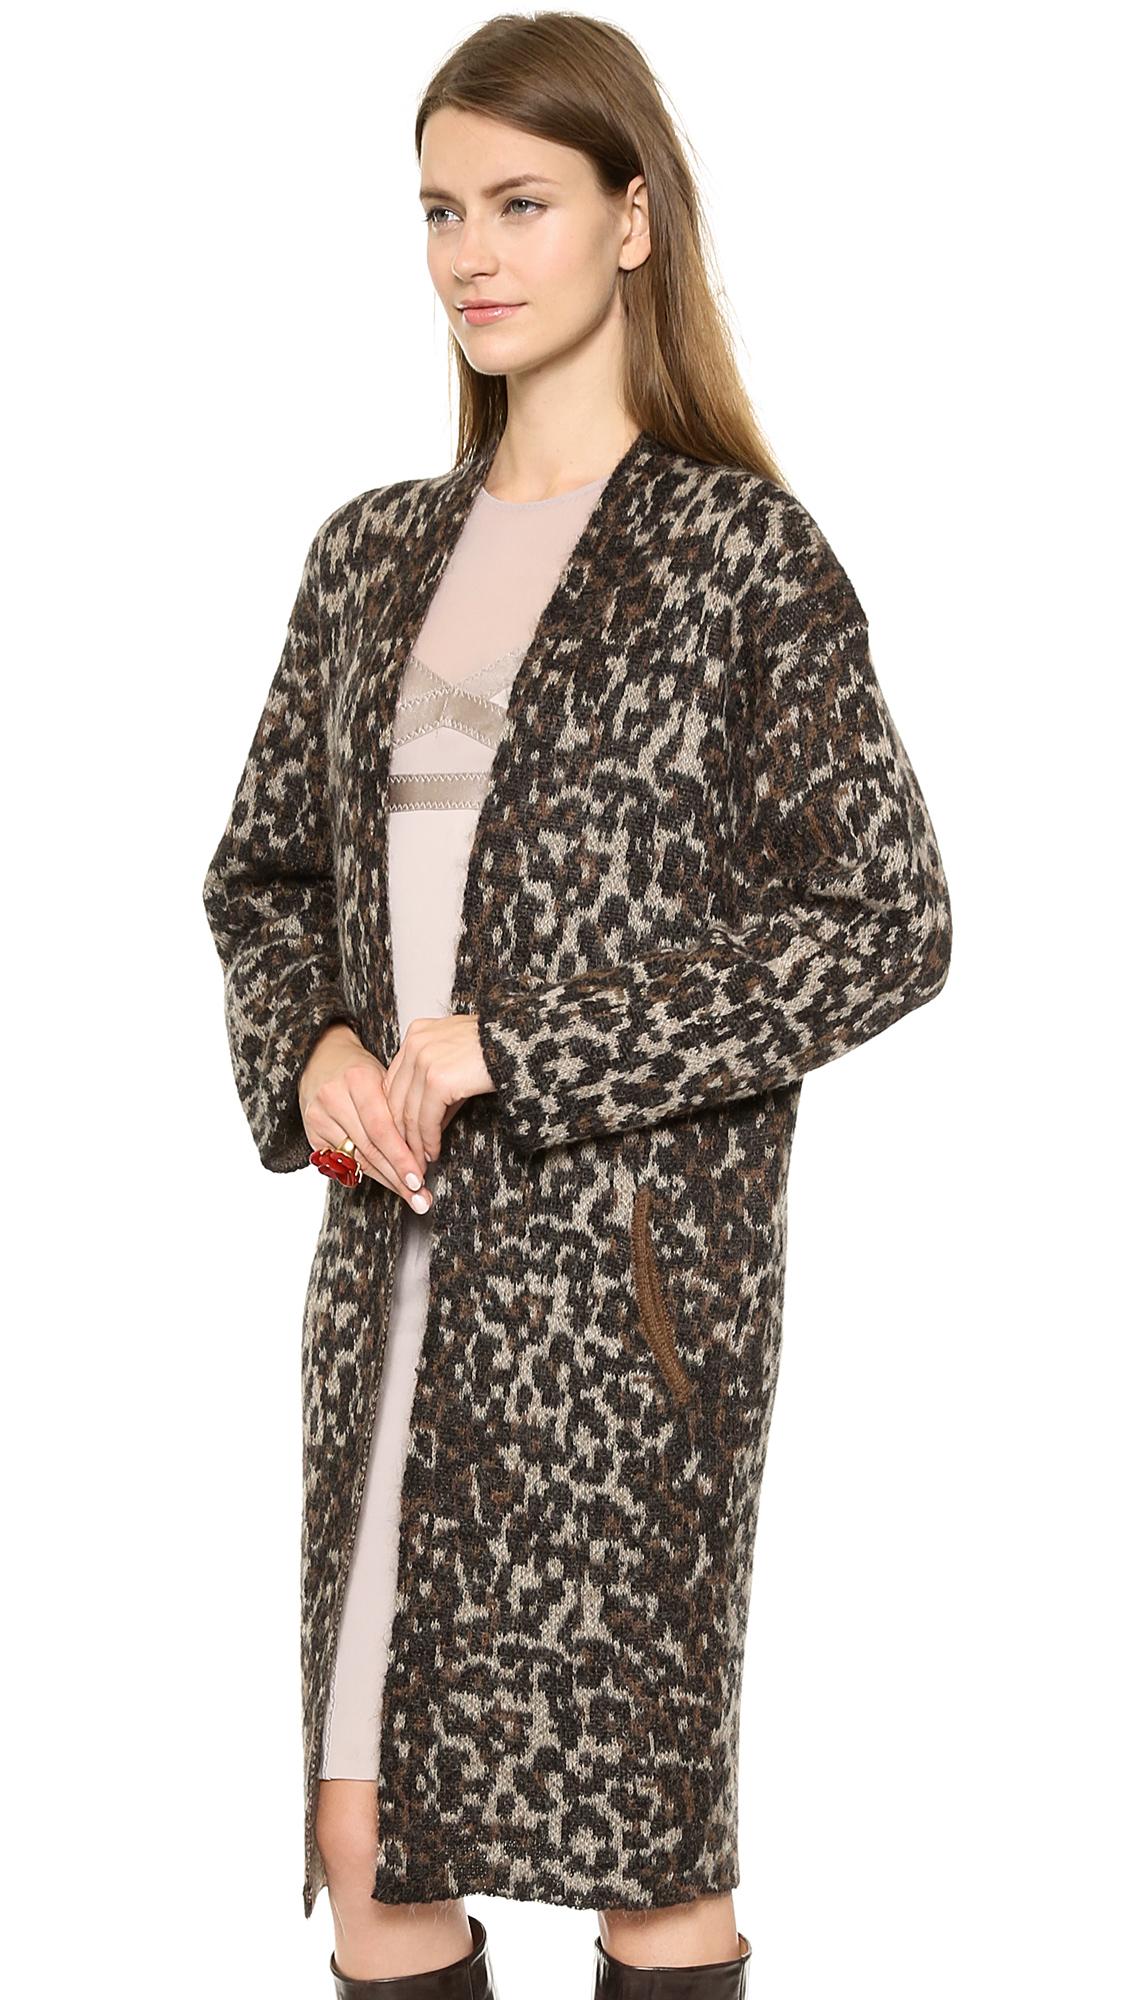 4225ac95f99c By Malene Birger Cameliu Leopard Print Cardigan in Brown - Lyst